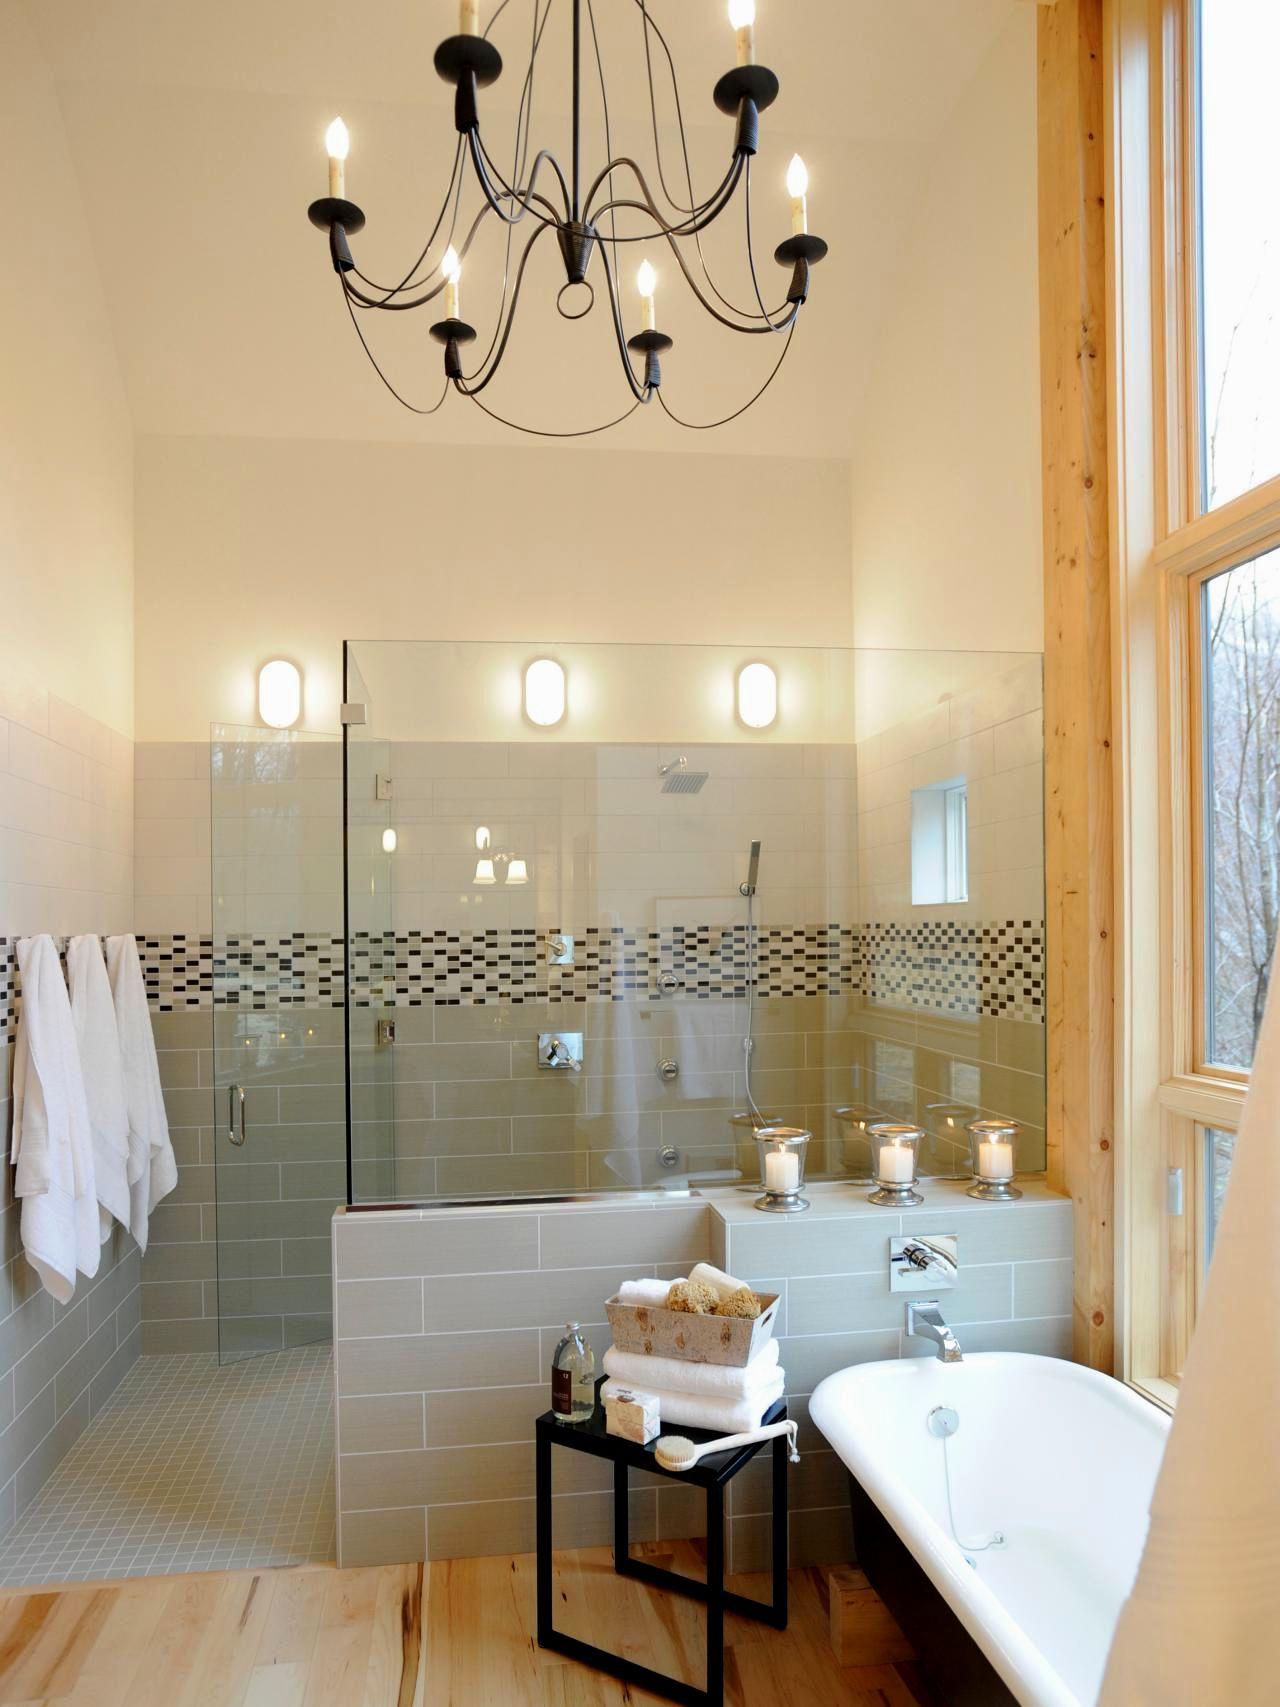 best of bathroom vanity lights layout-Beautiful Bathroom Vanity Lights Concept